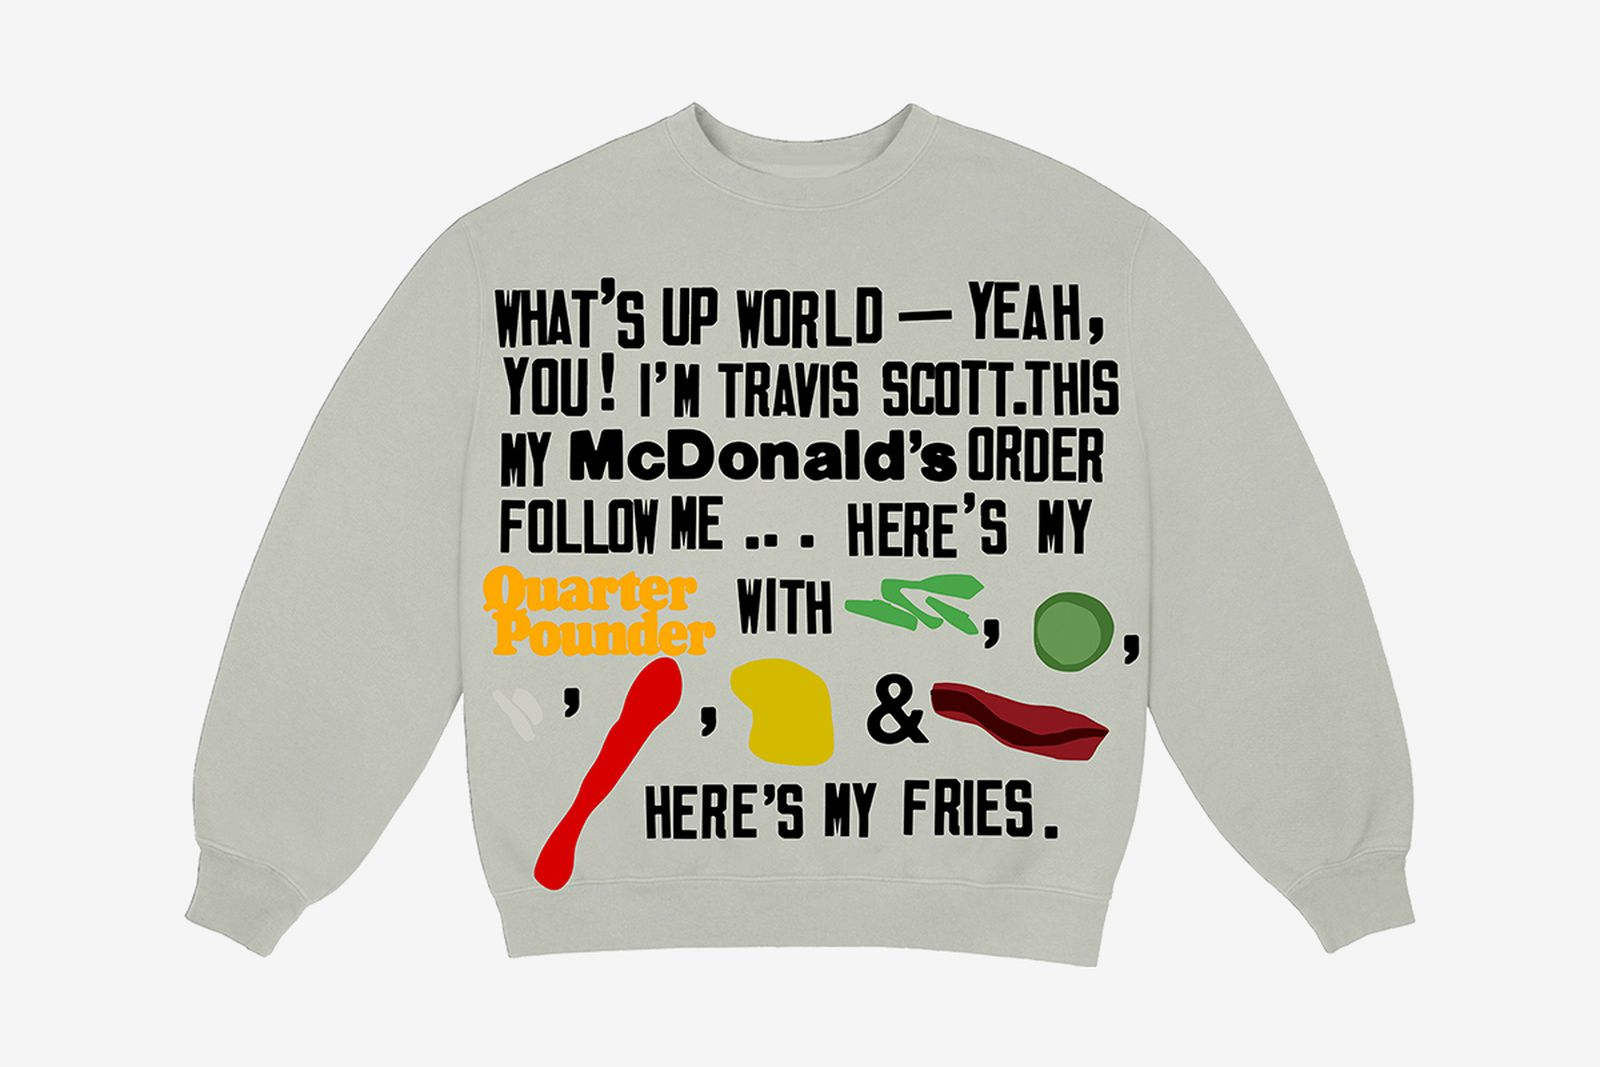 travis-scott-mcdonalds-merch-3-06